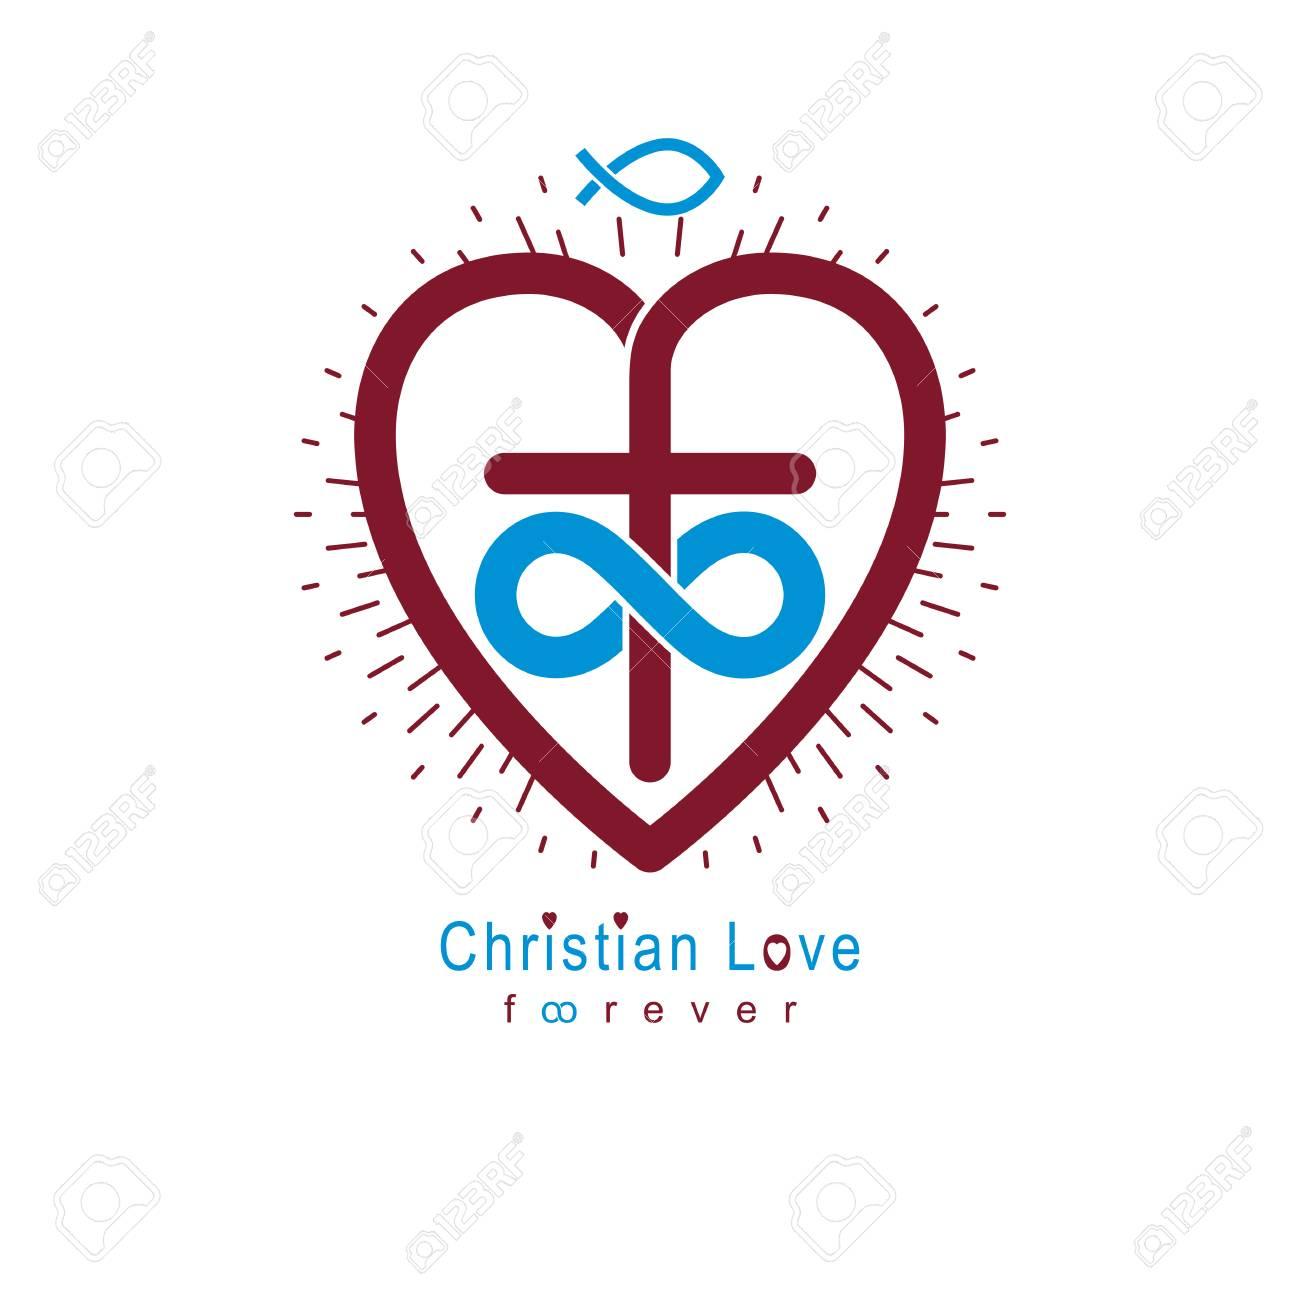 True Infinite Christian Love and Belief in God, vector creative...